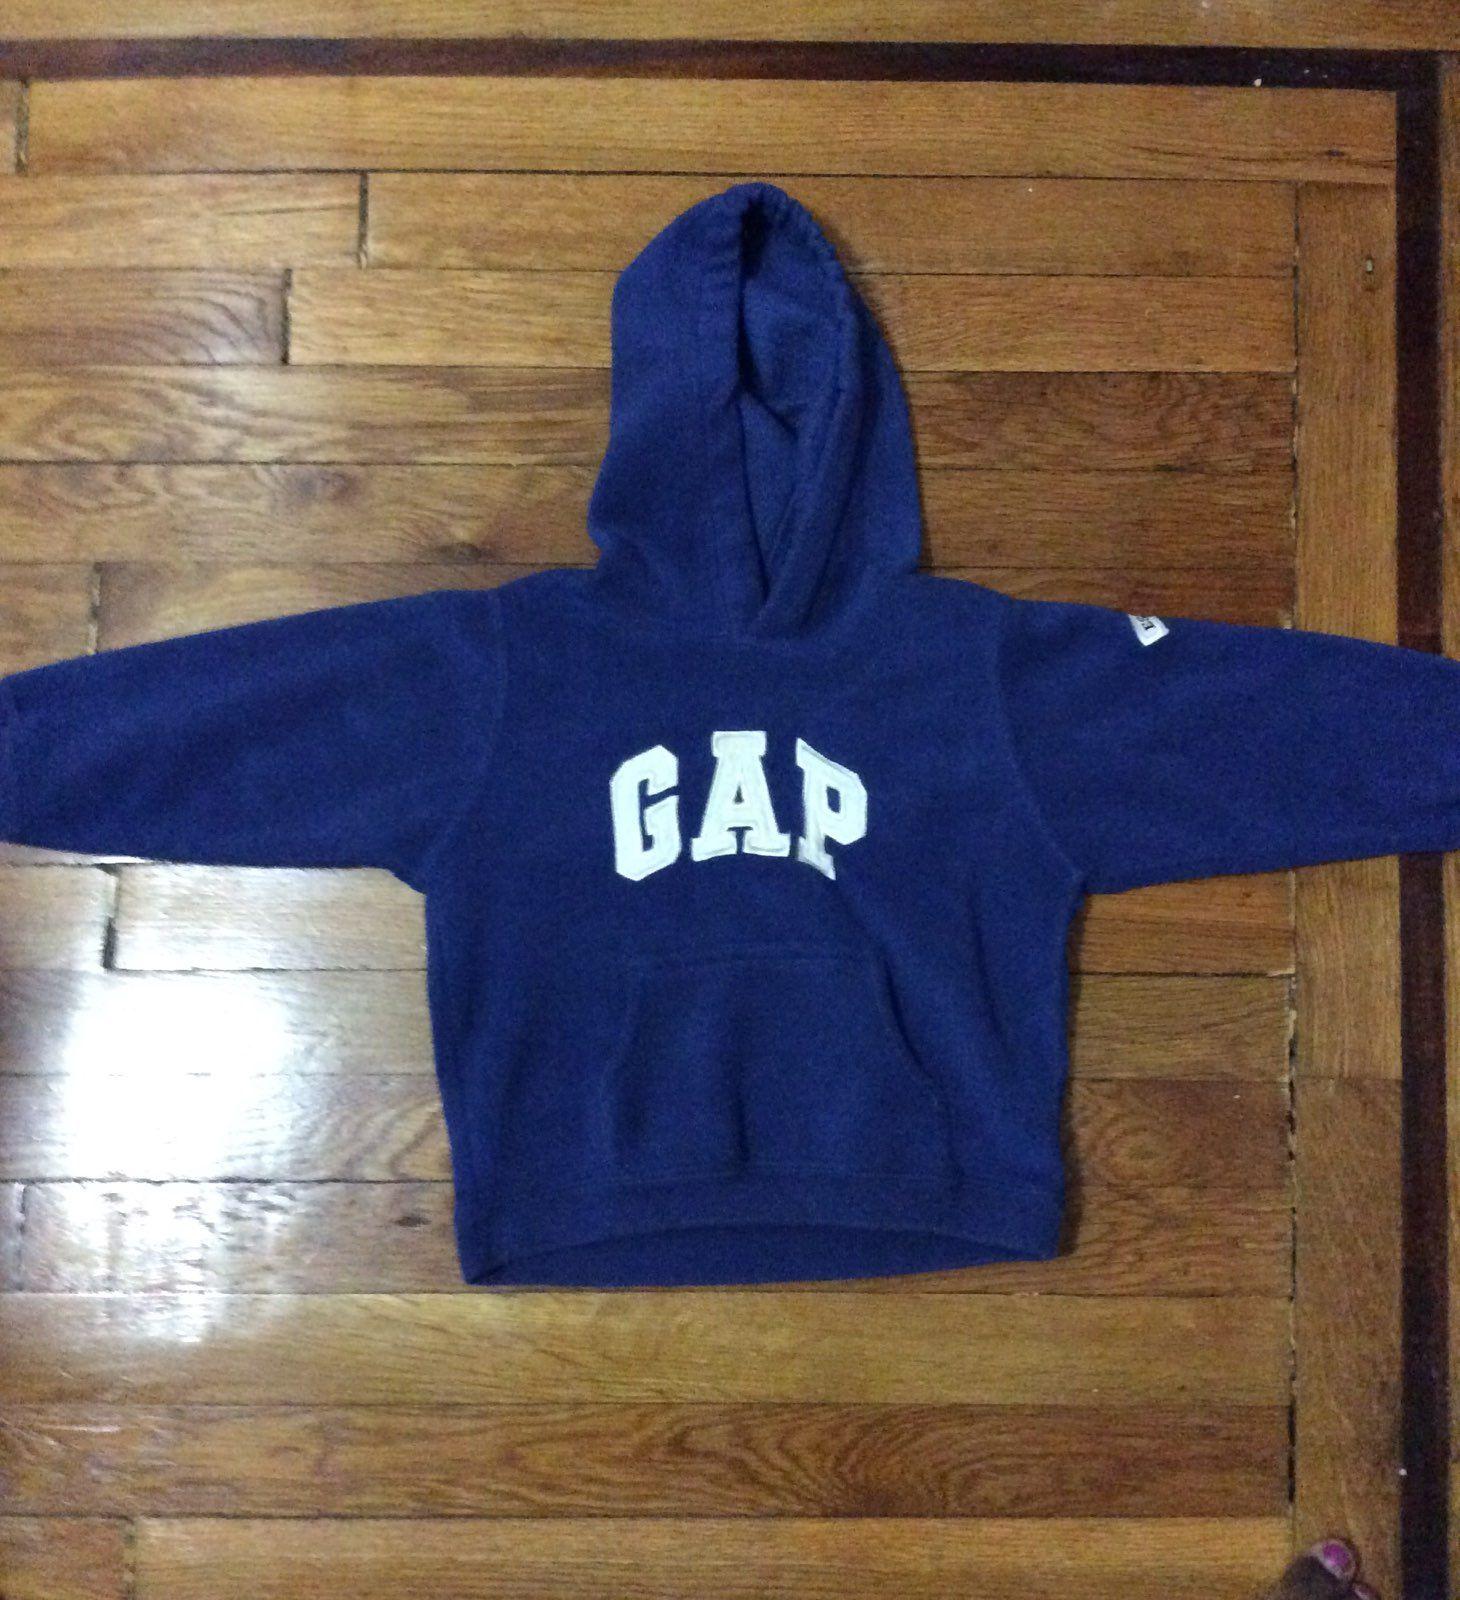 Gap Royal Blue Pullover Sweater - Mercari: BUY & SELL THINGS YOU LOVE